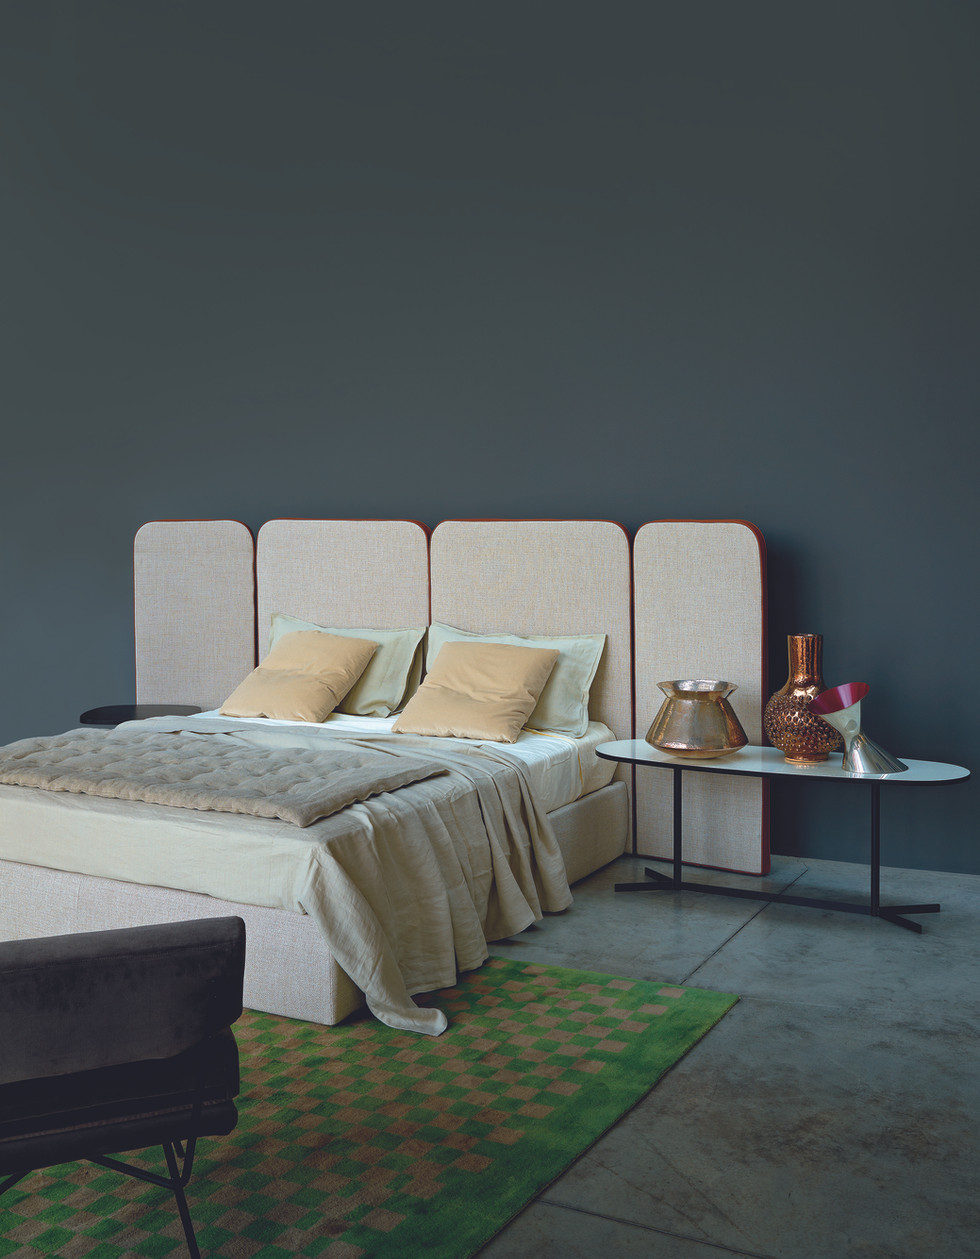 arflex-palazzo-design-bernhardtvella_am